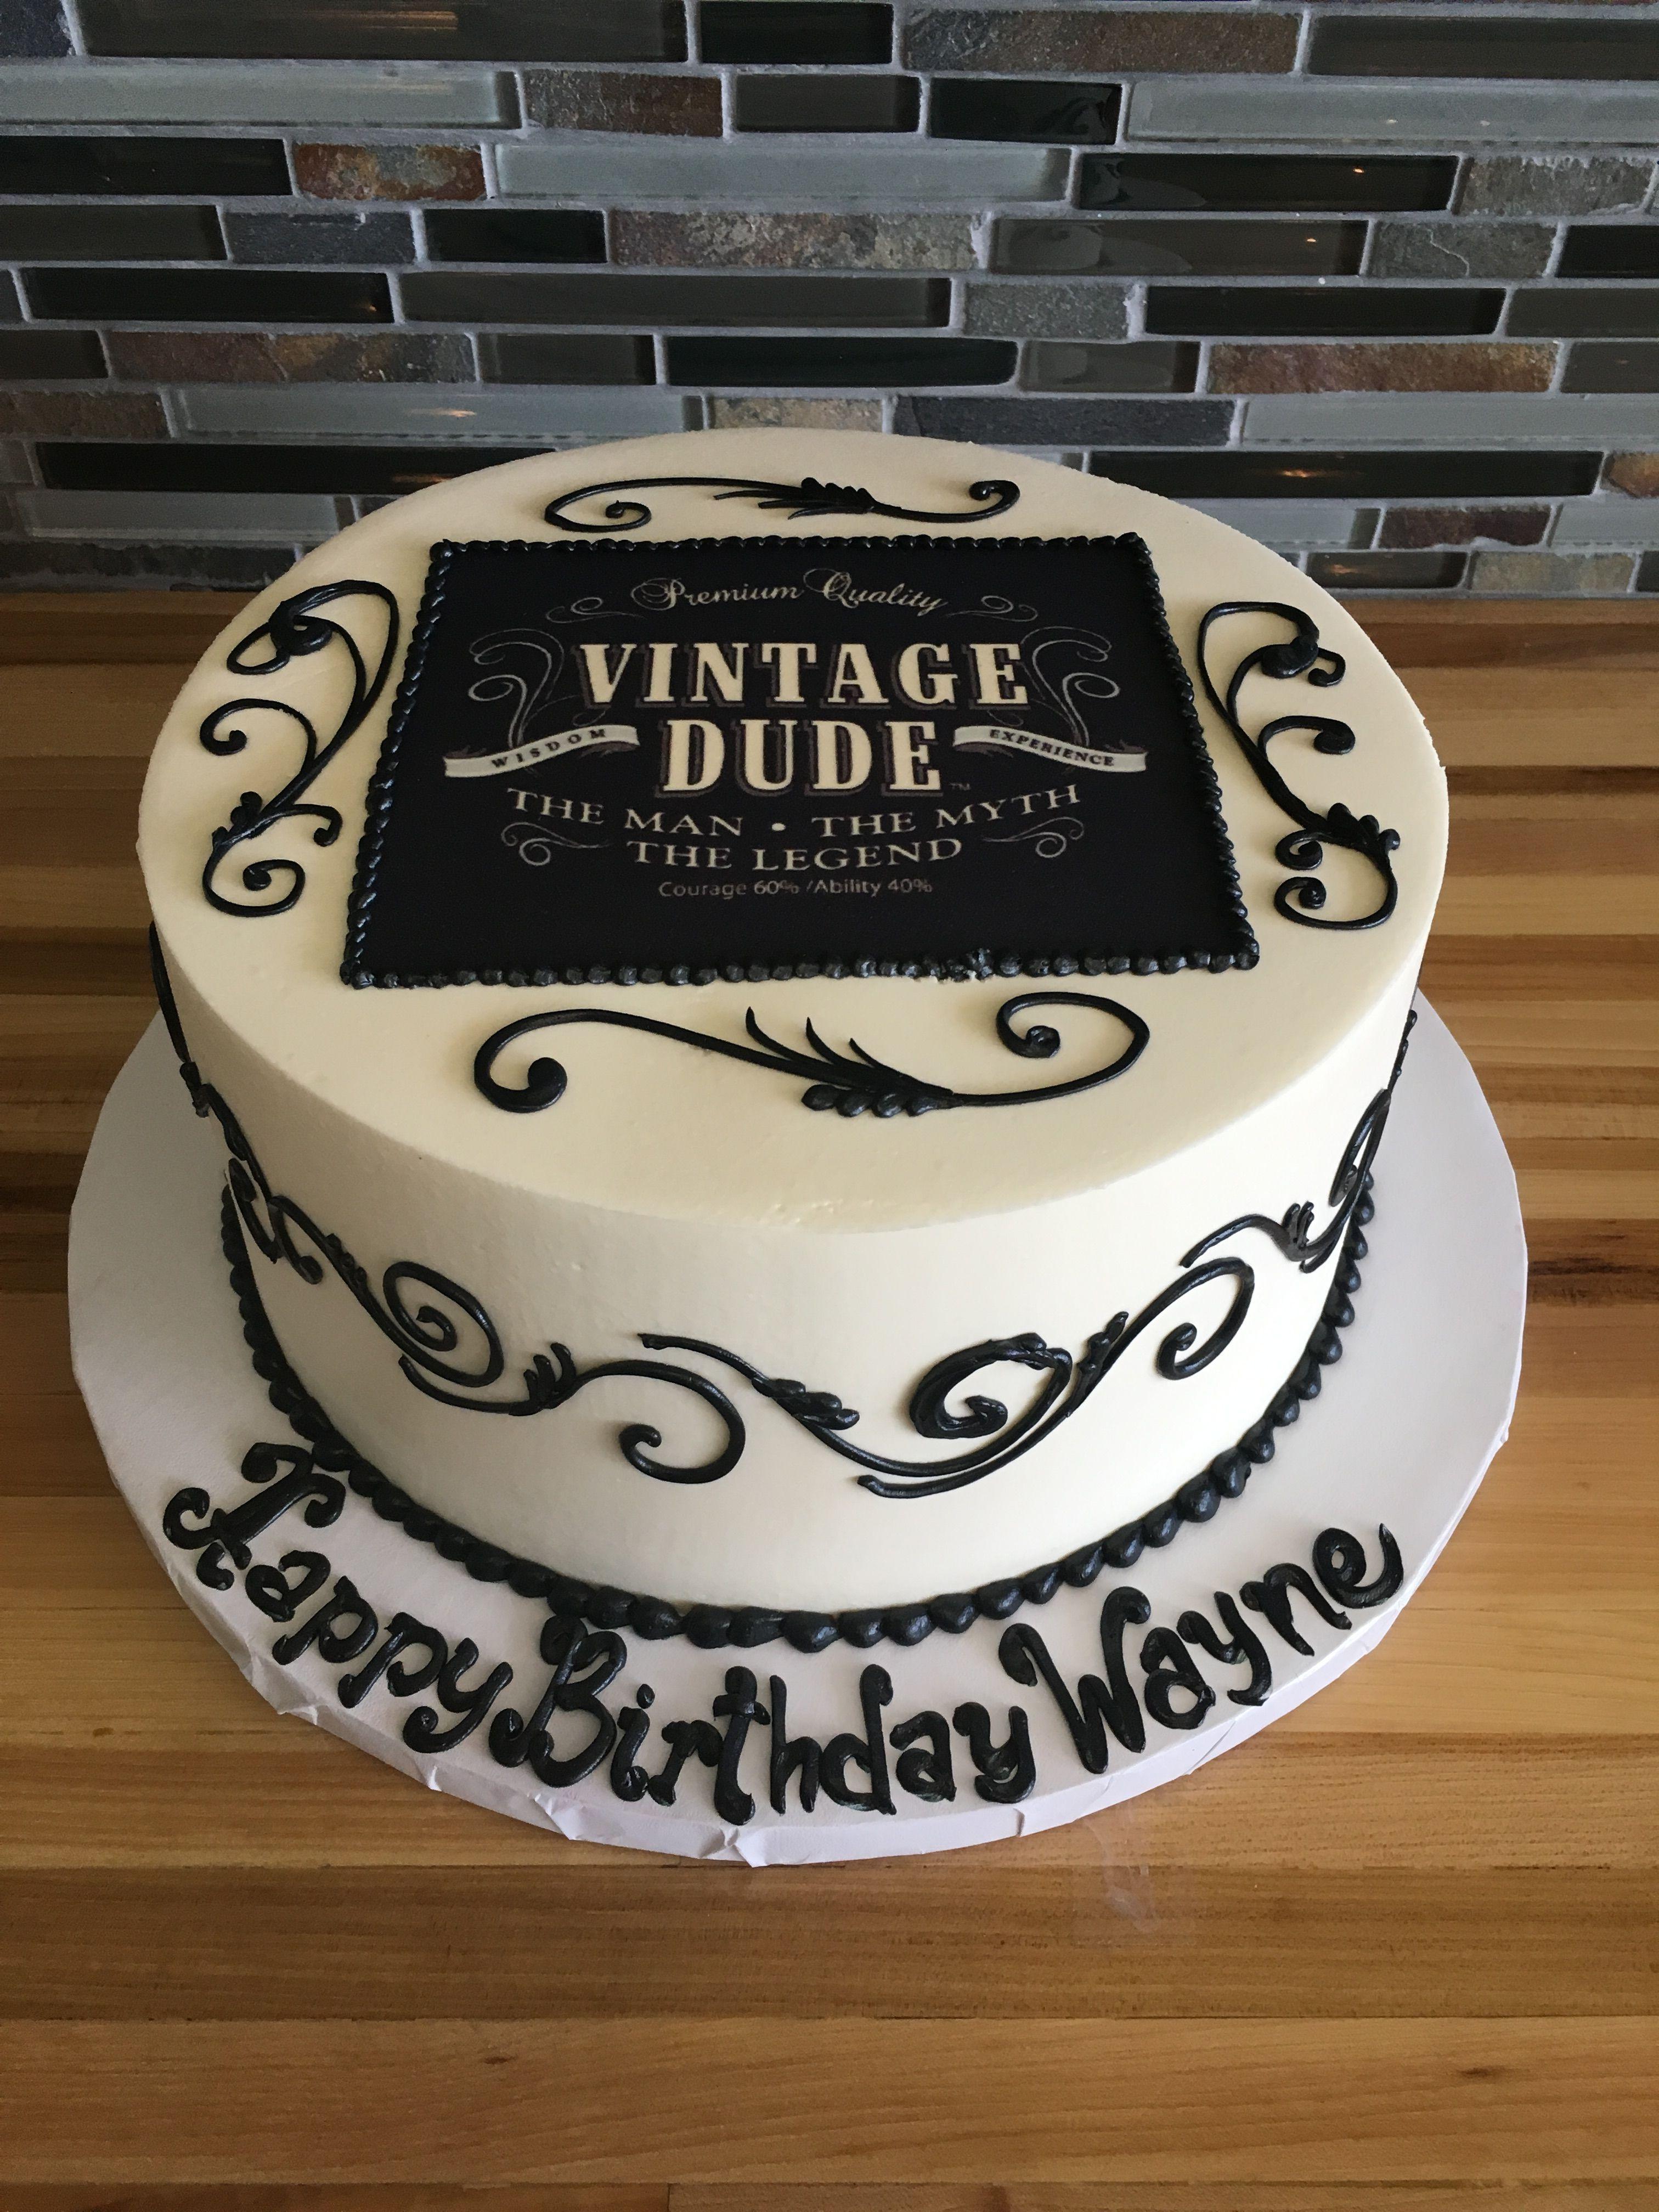 Vintage Dude Birthday Cake Scroll Work Birthday Cakes